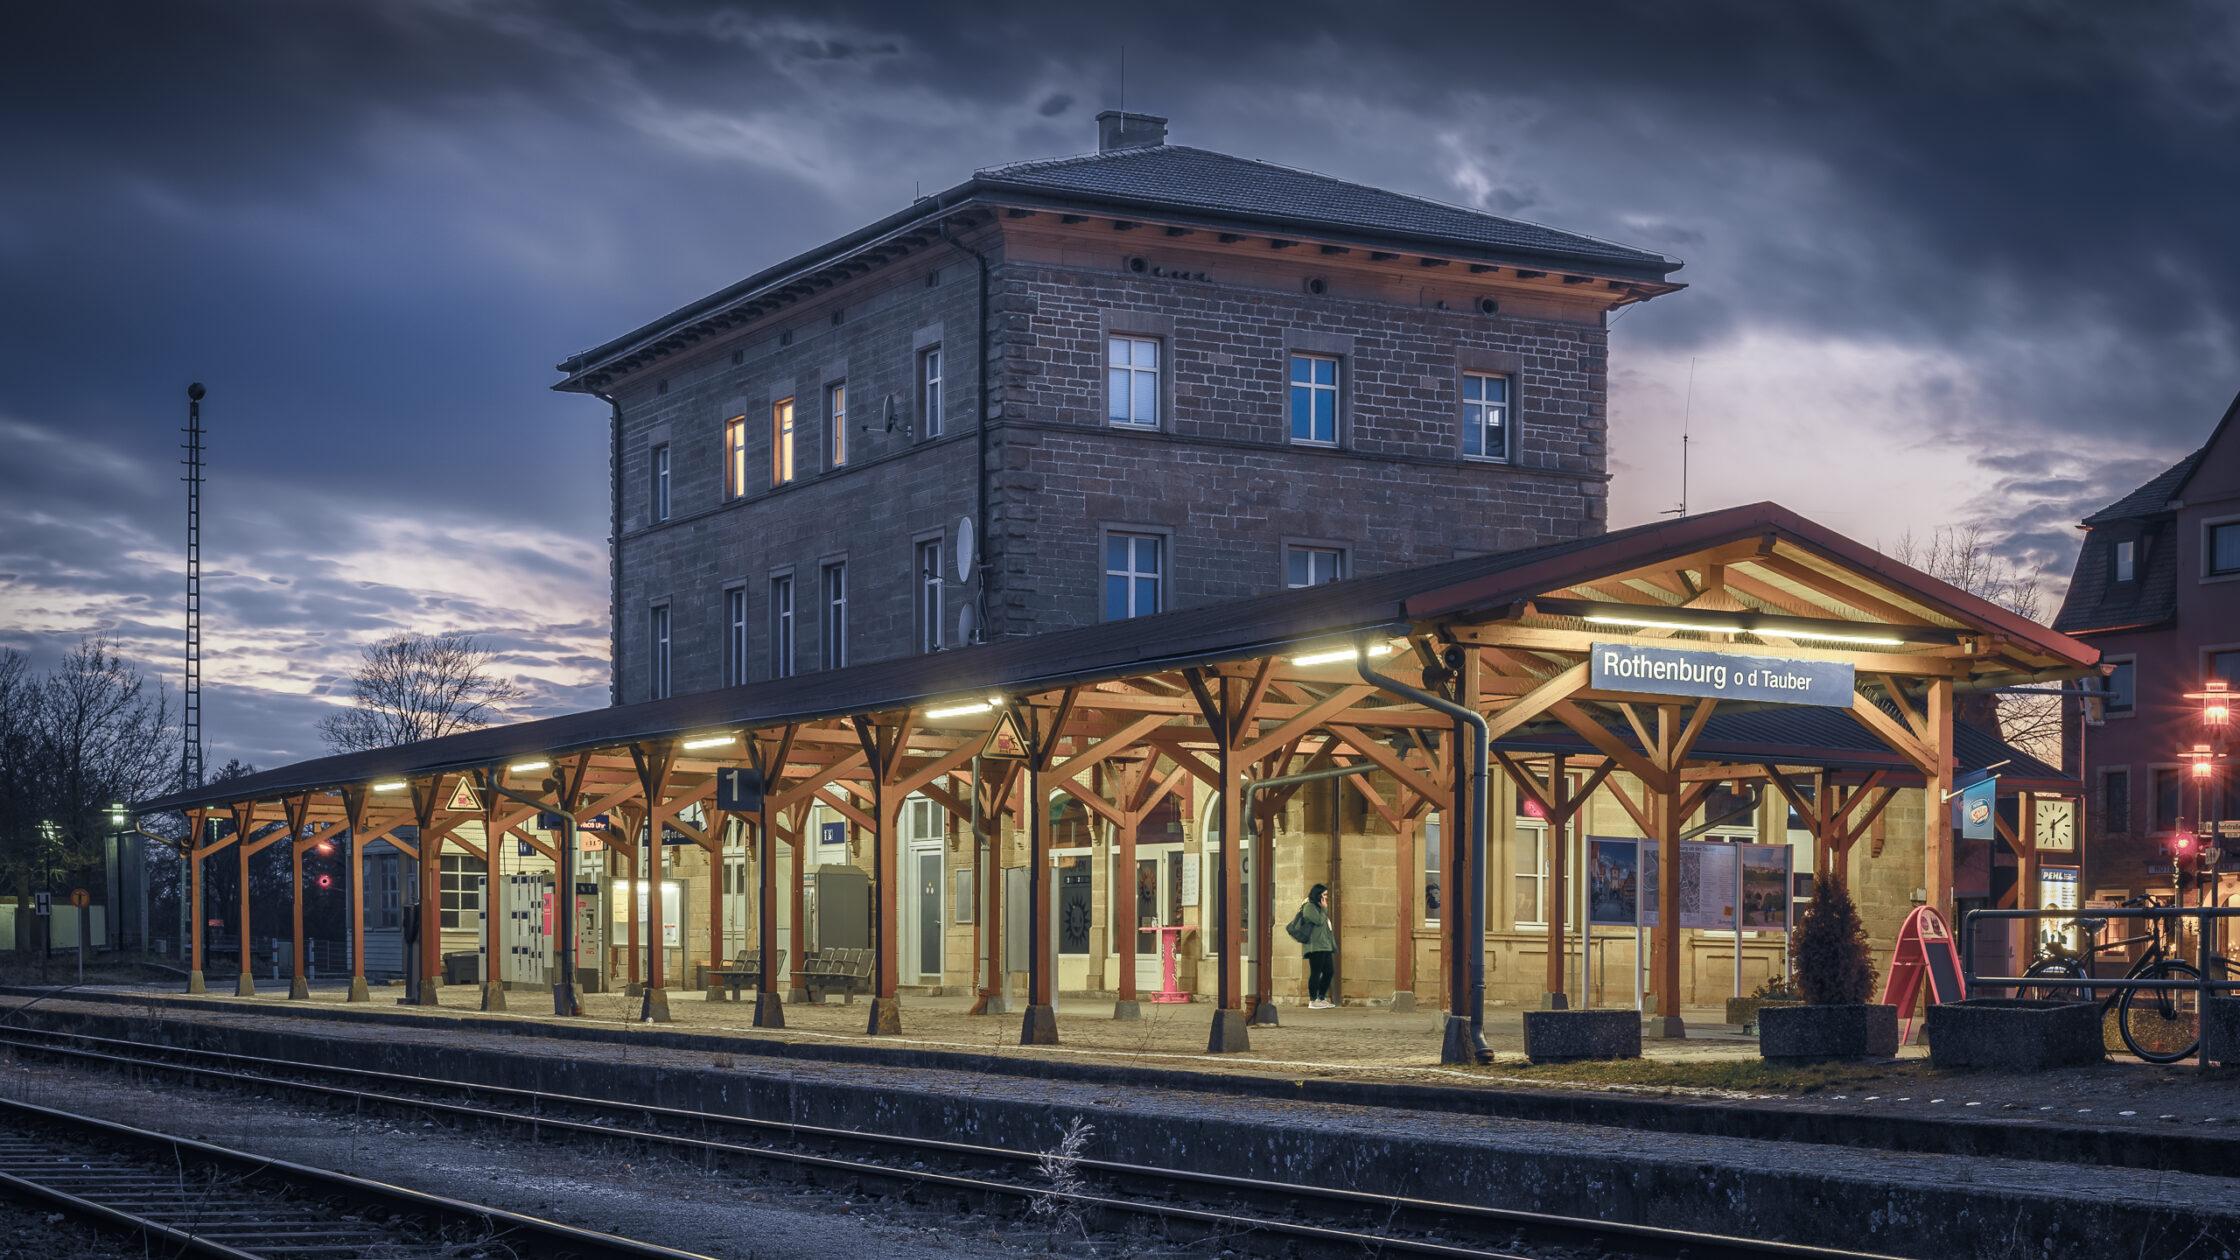 Bahnhof Rothenburg ob der Tauber / 20190219180934